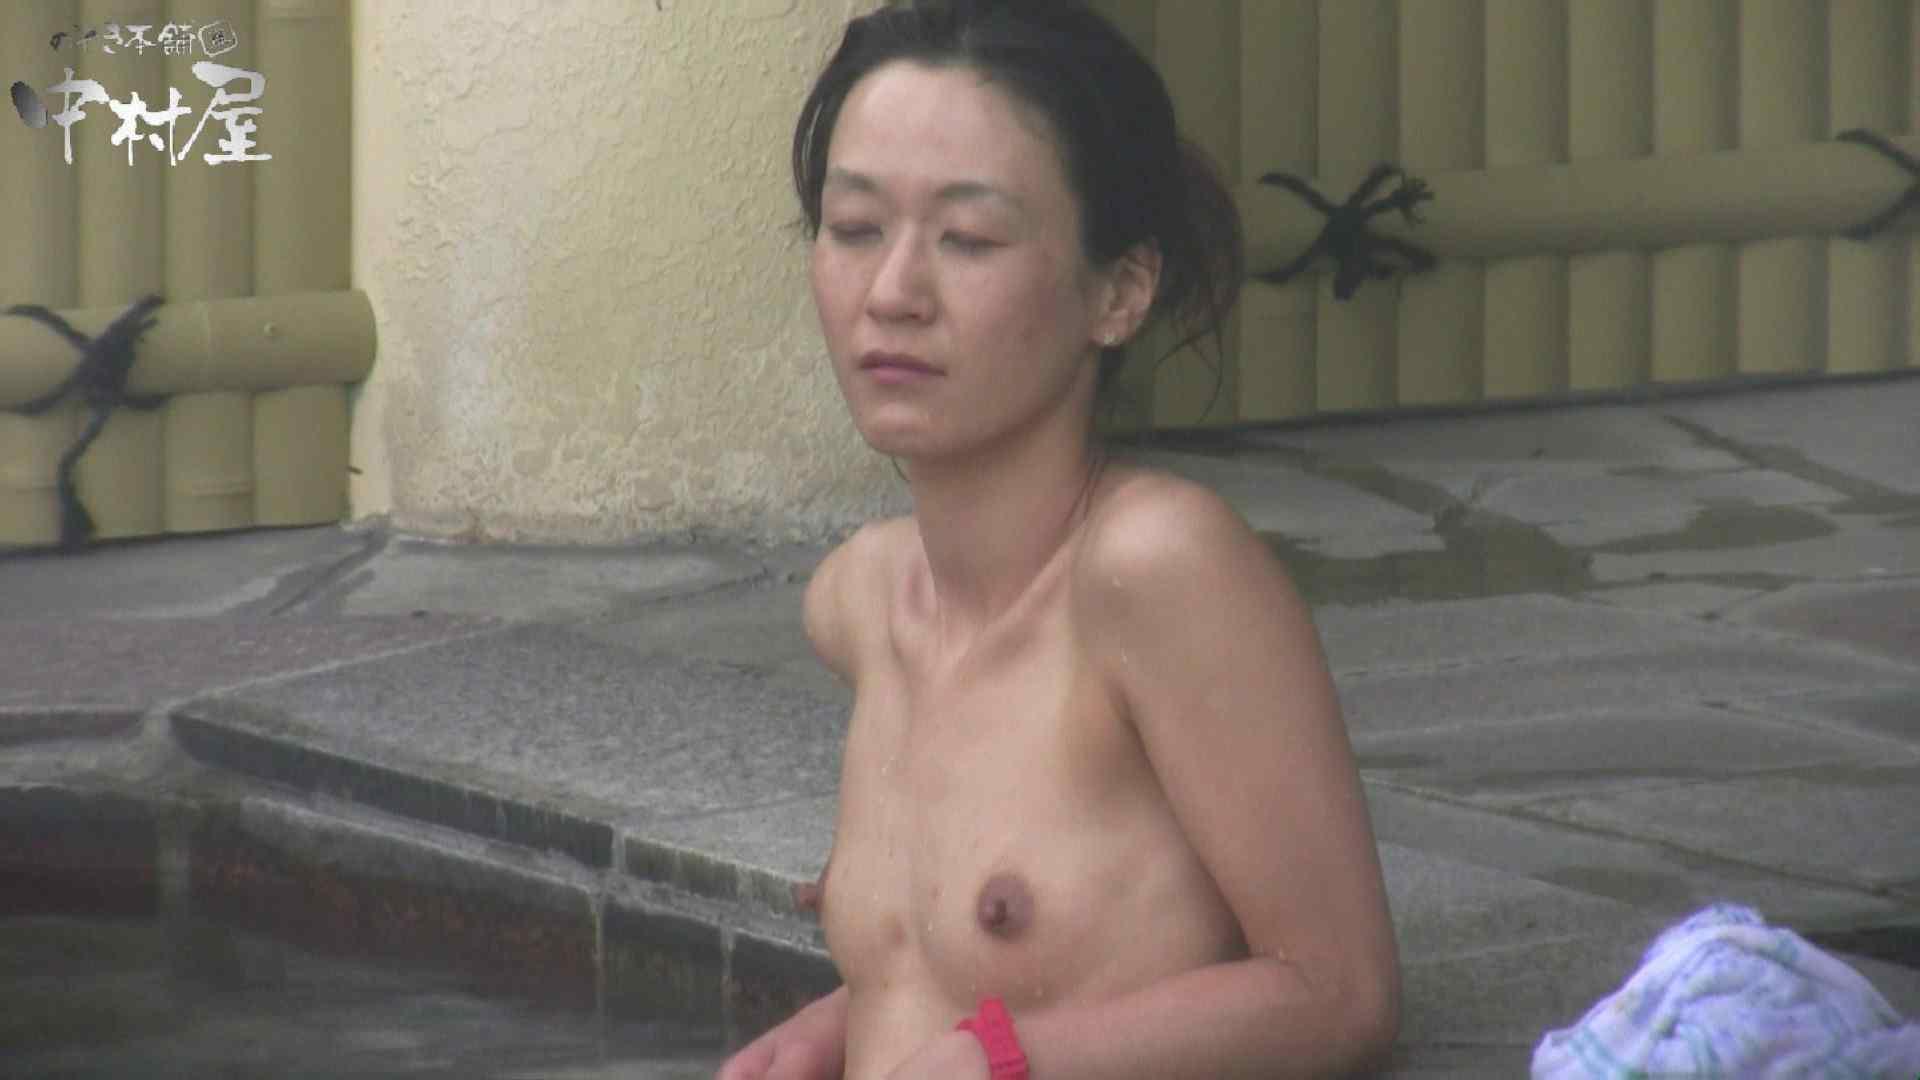 Aquaな露天風呂Vol.928 OLセックス  99画像 63